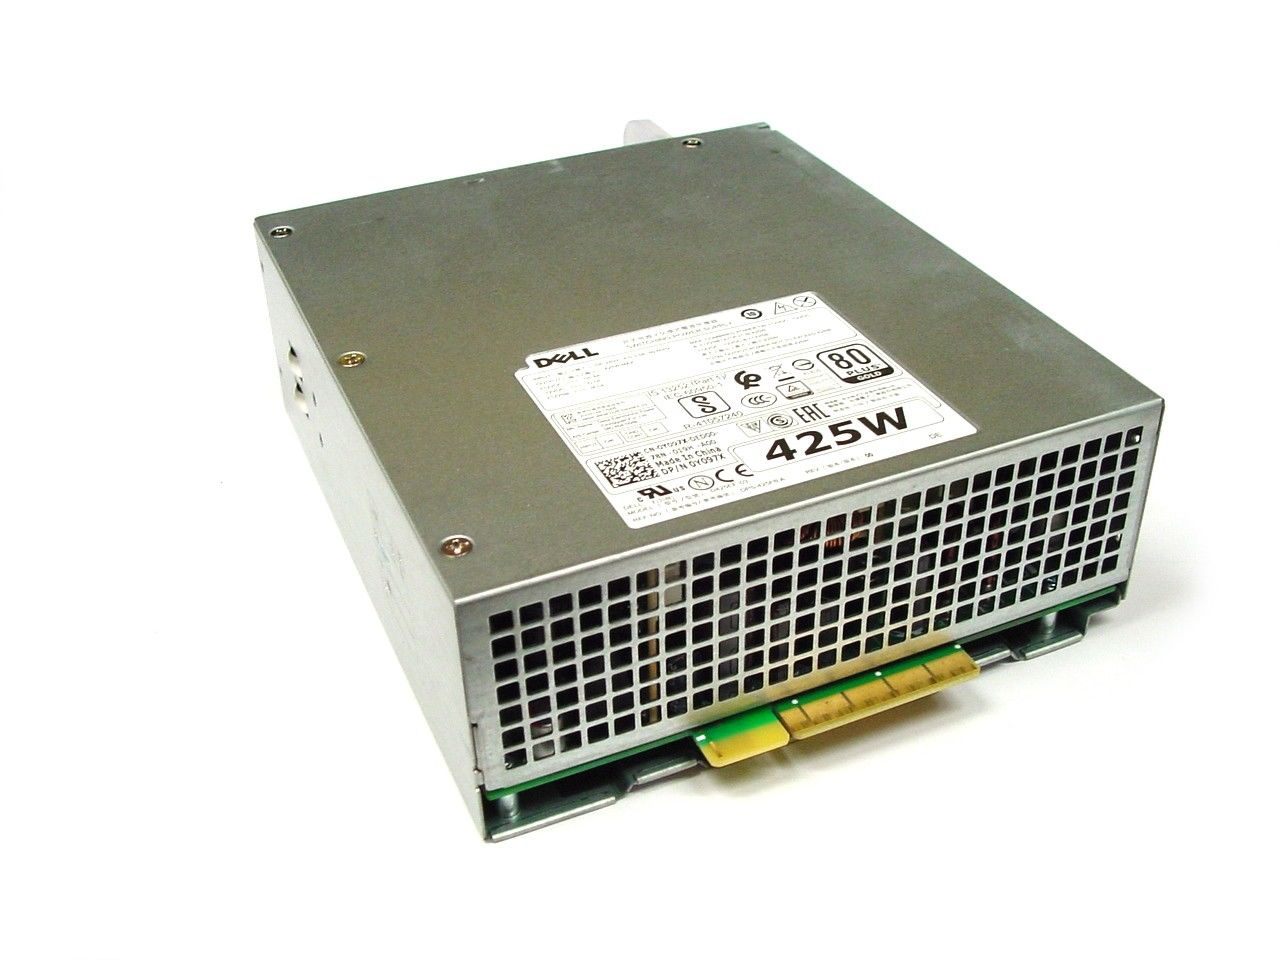 DELL Precision T5820 T7820 Netzteil Power Supply PSU 425W Y097X